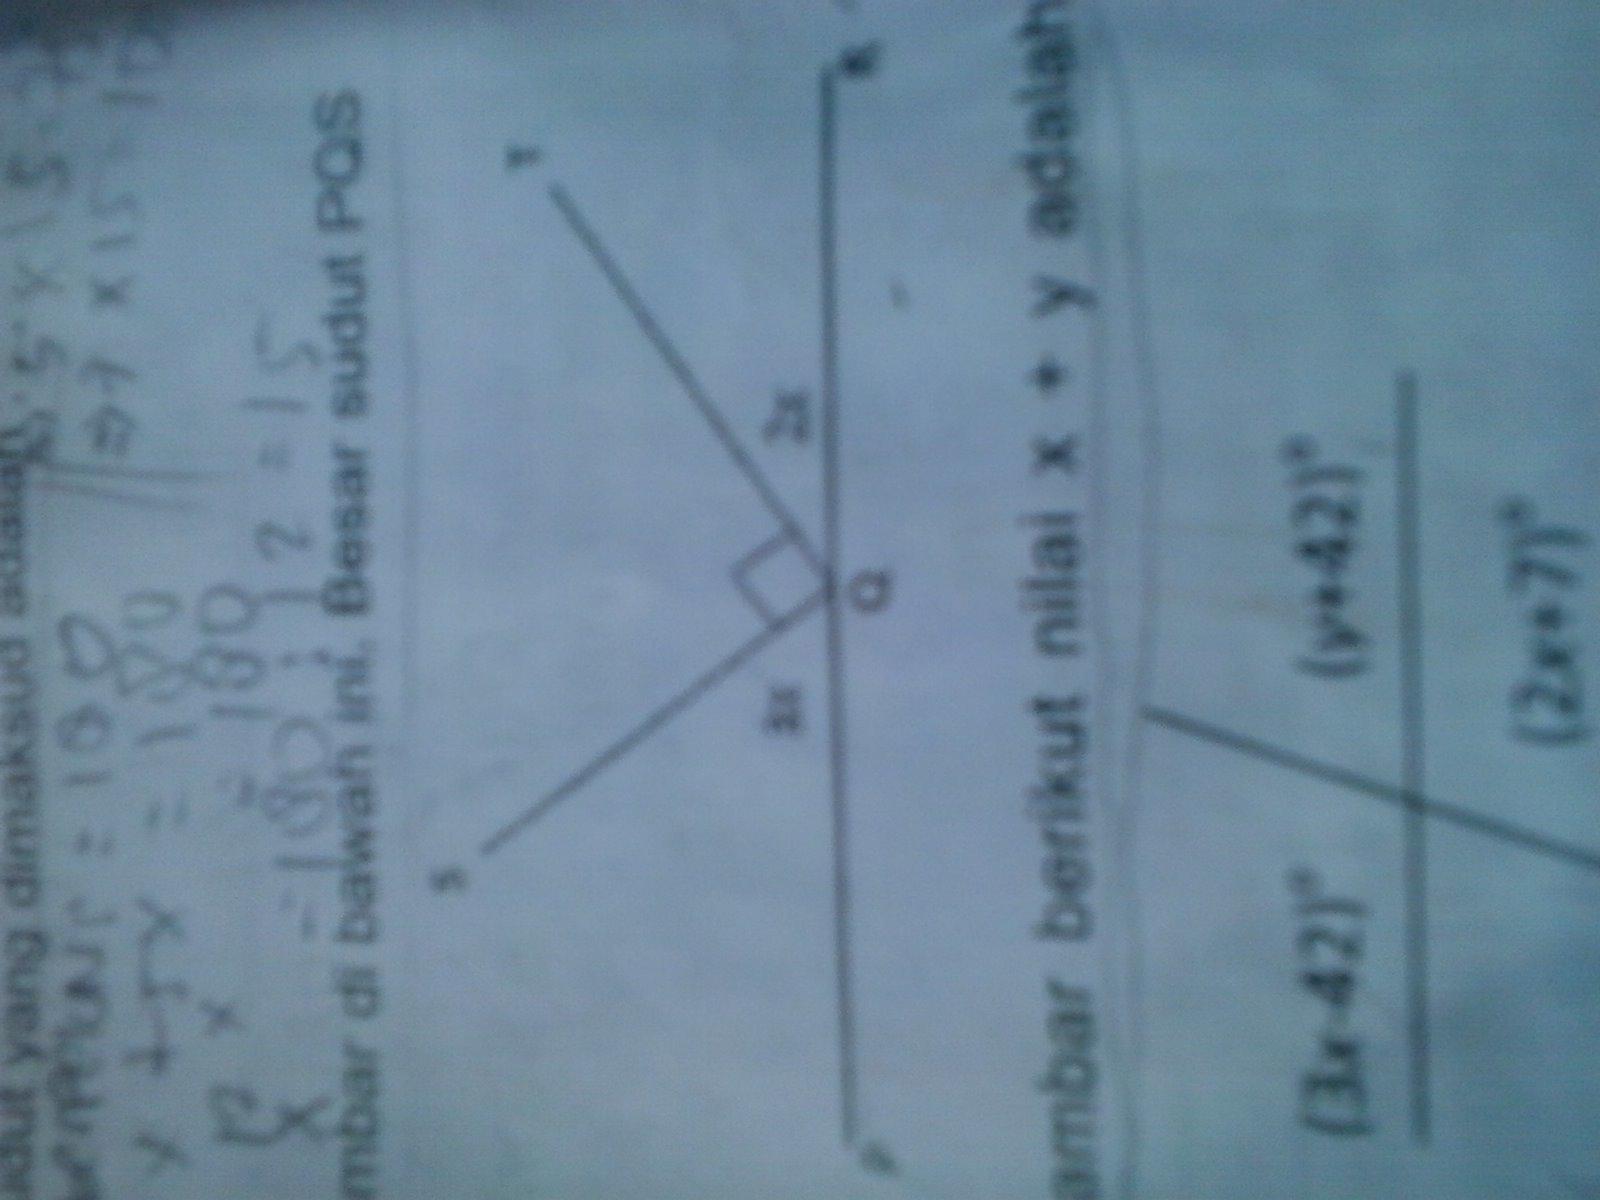 perhatikan gambar di bawah ini.Besar sudut PQS adalah ...